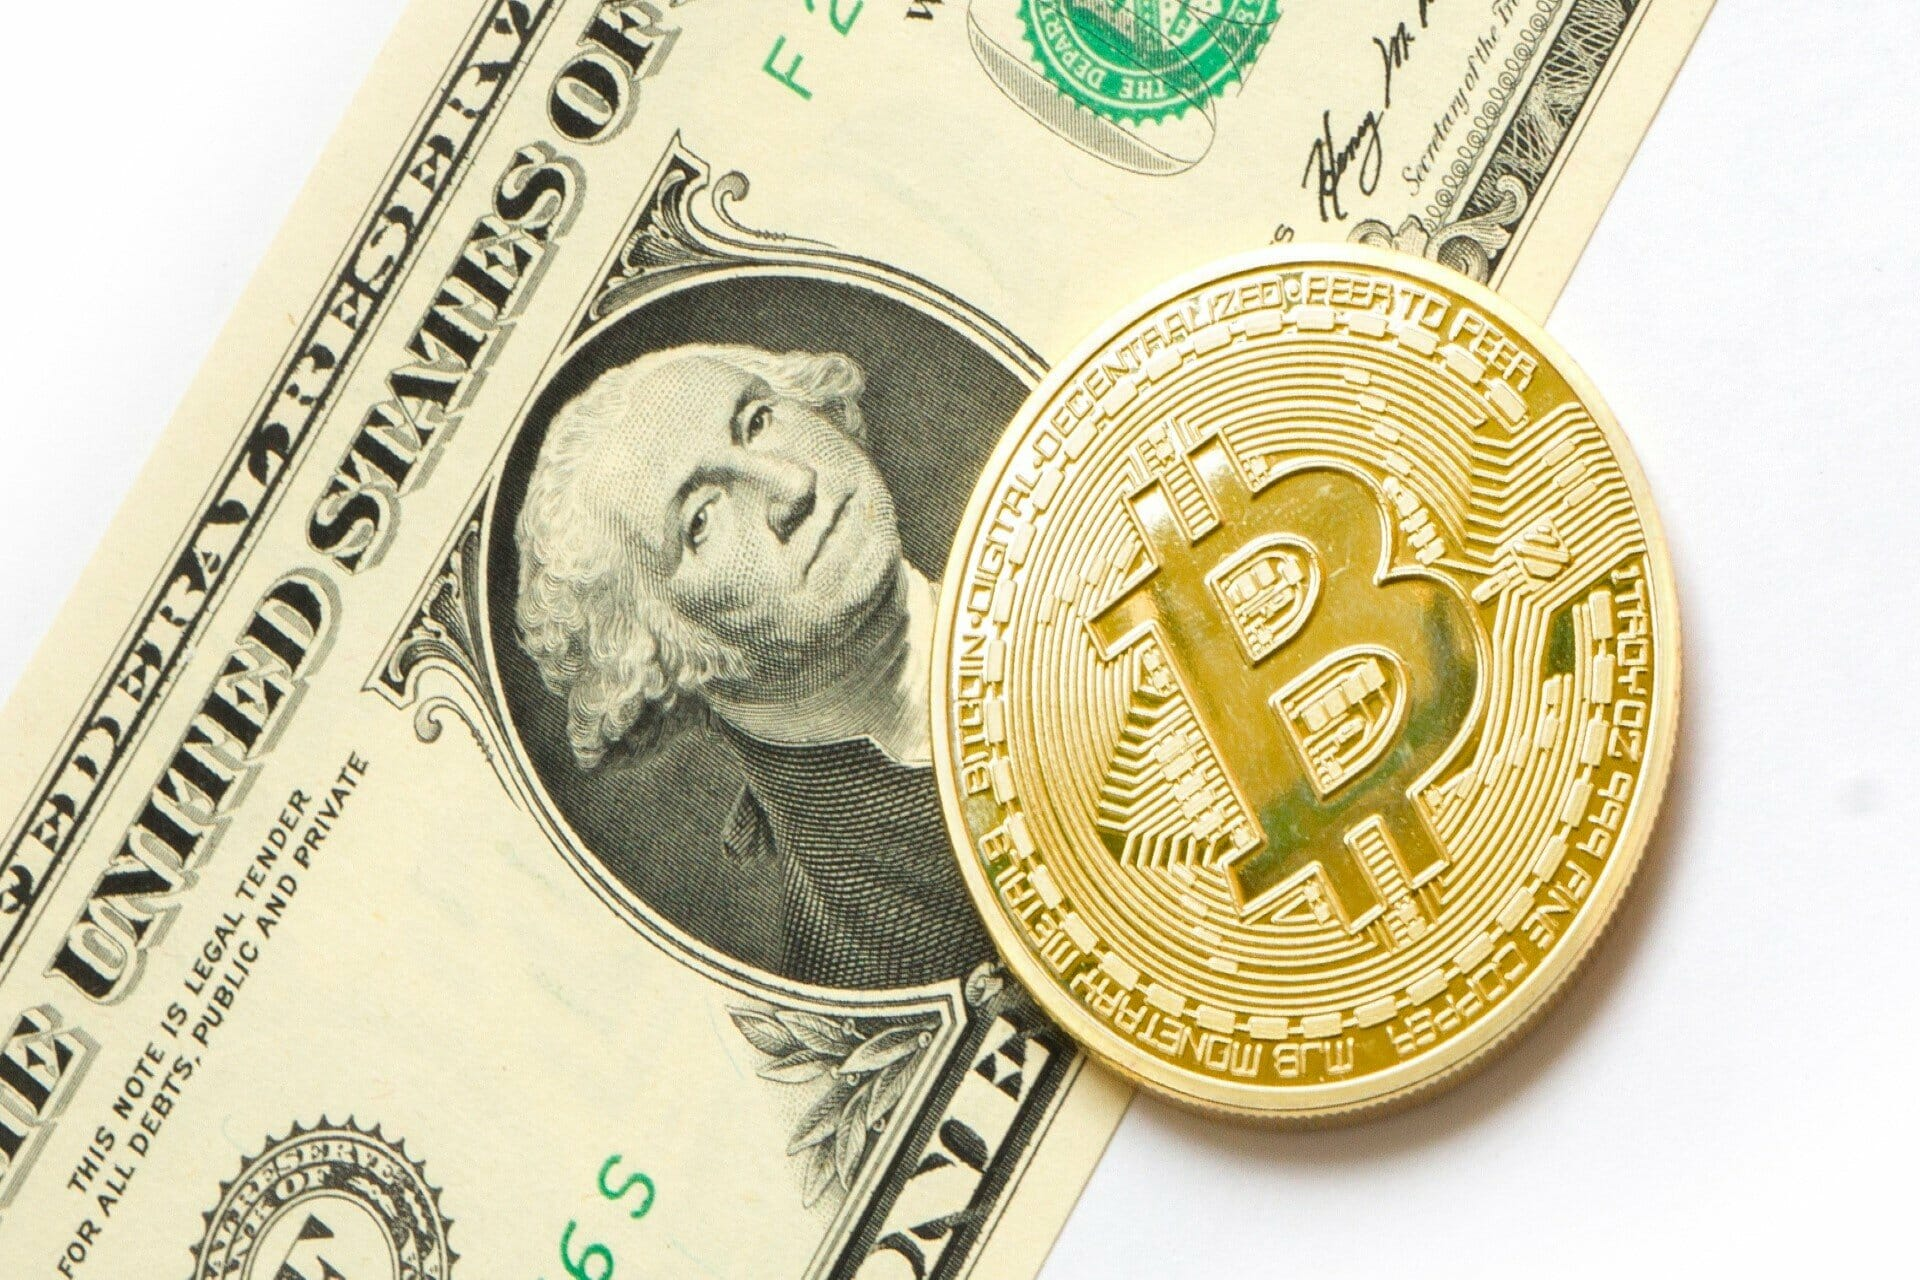 Upgrade Launches Bitcoin Rewards Card crypto credit card